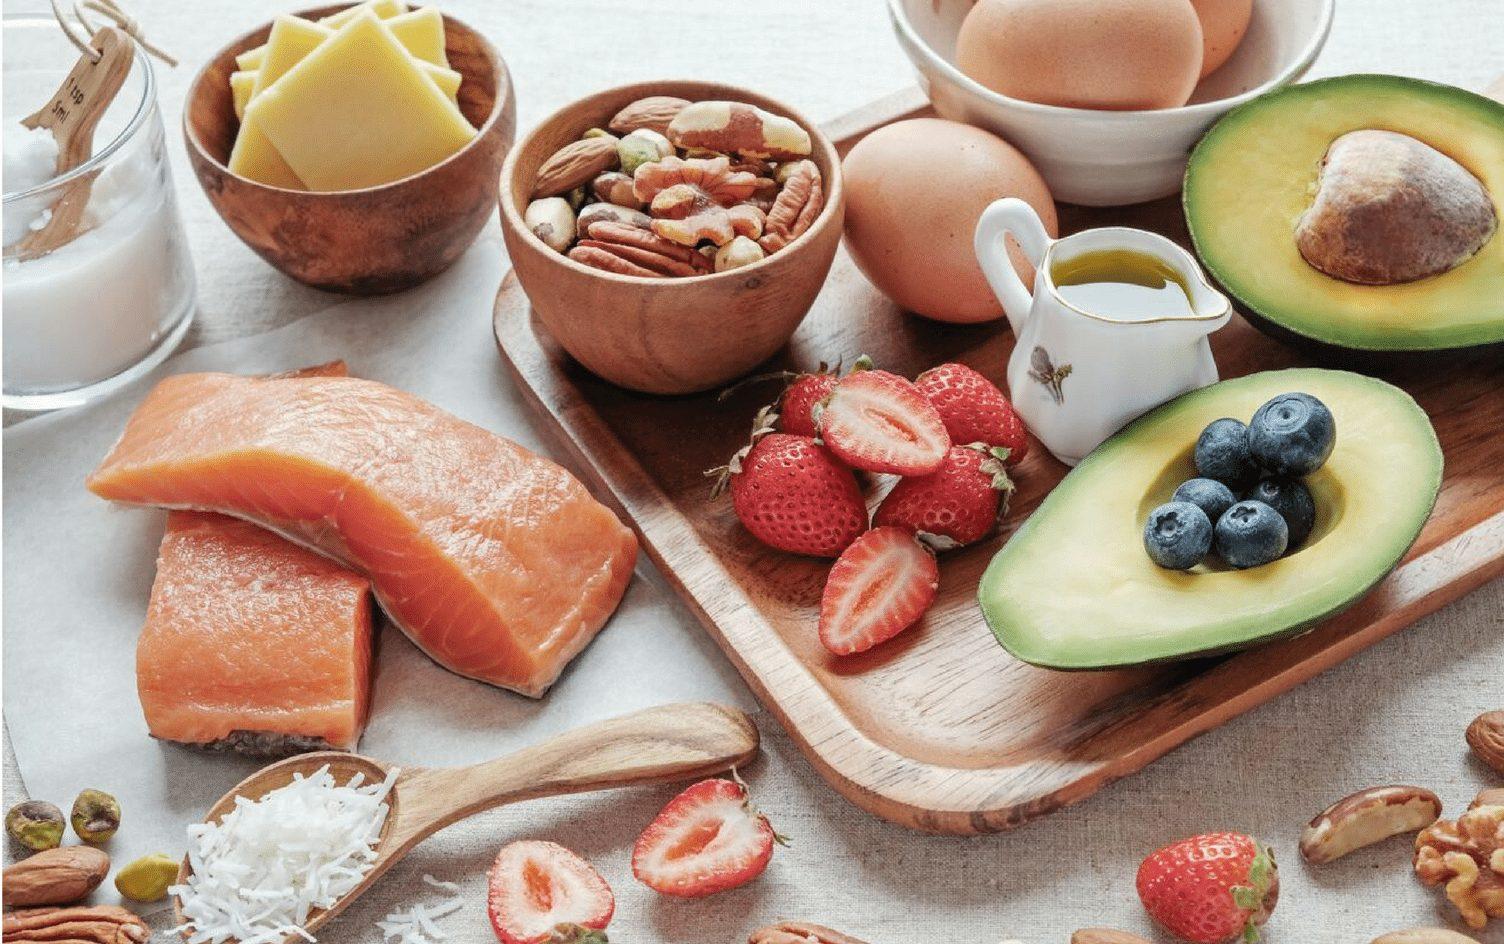 nutritionist ketogenic diet near me